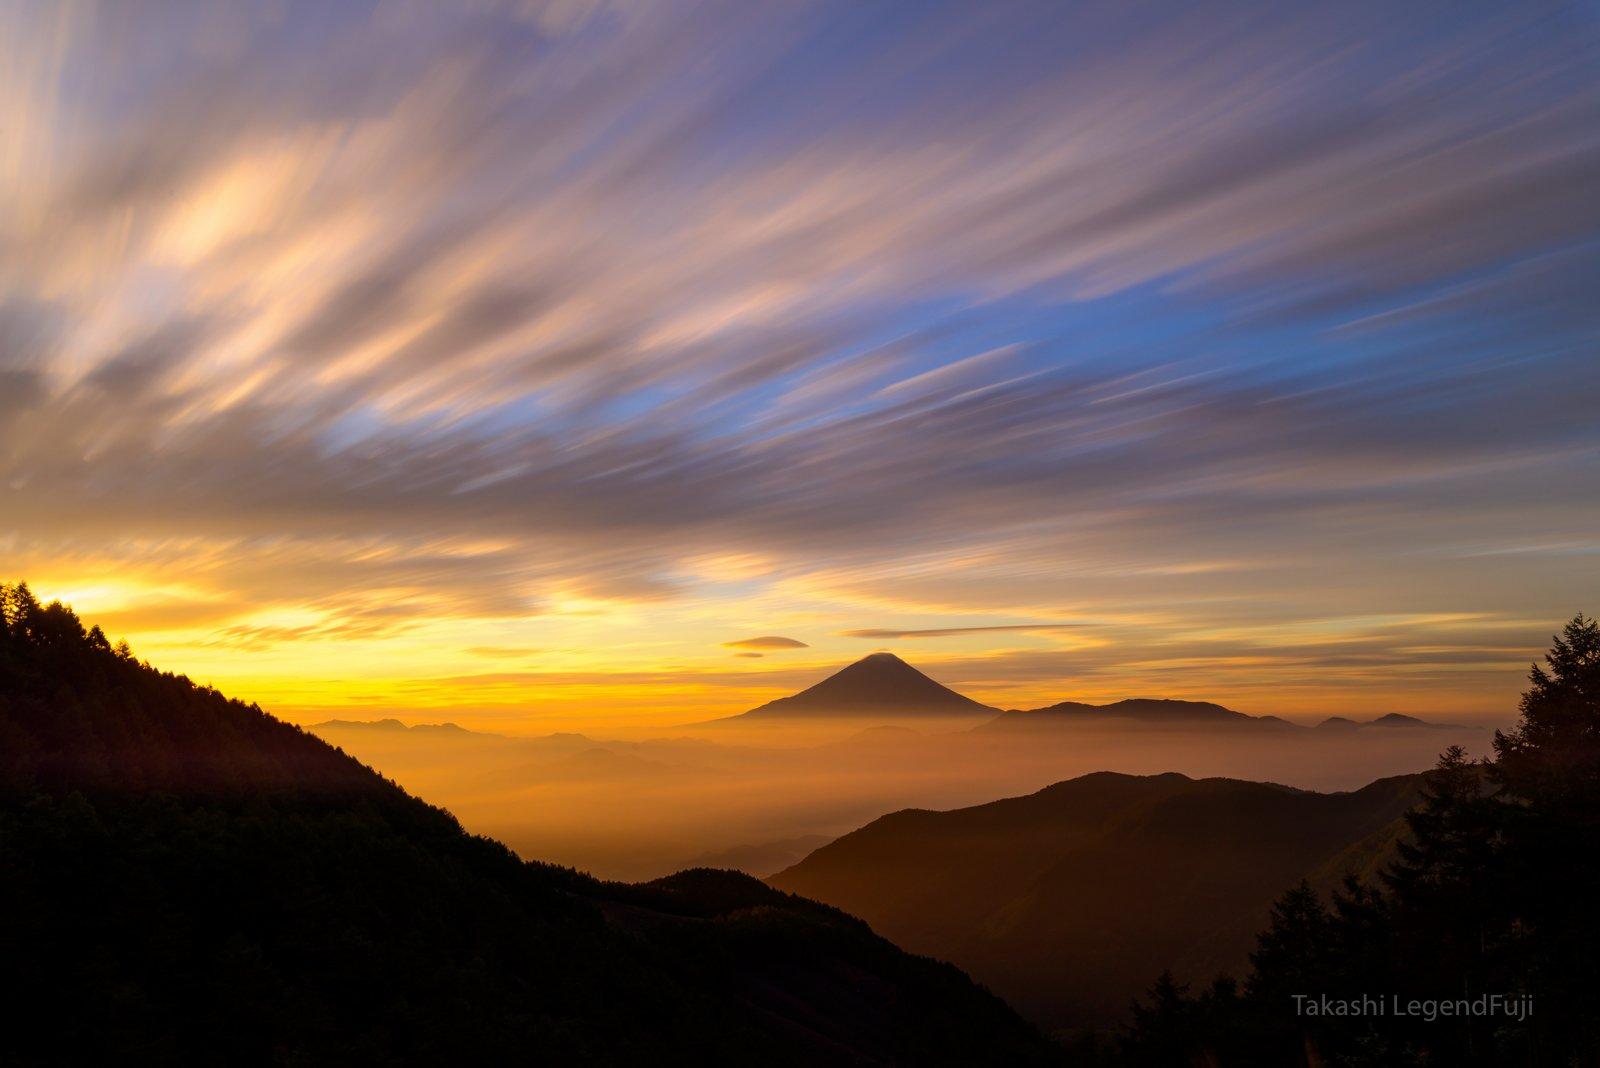 Fuji,Japan,mountain,cloud,morning,glow,red,orange,sky,beautiful,sunshine,sunrise,, Takashi